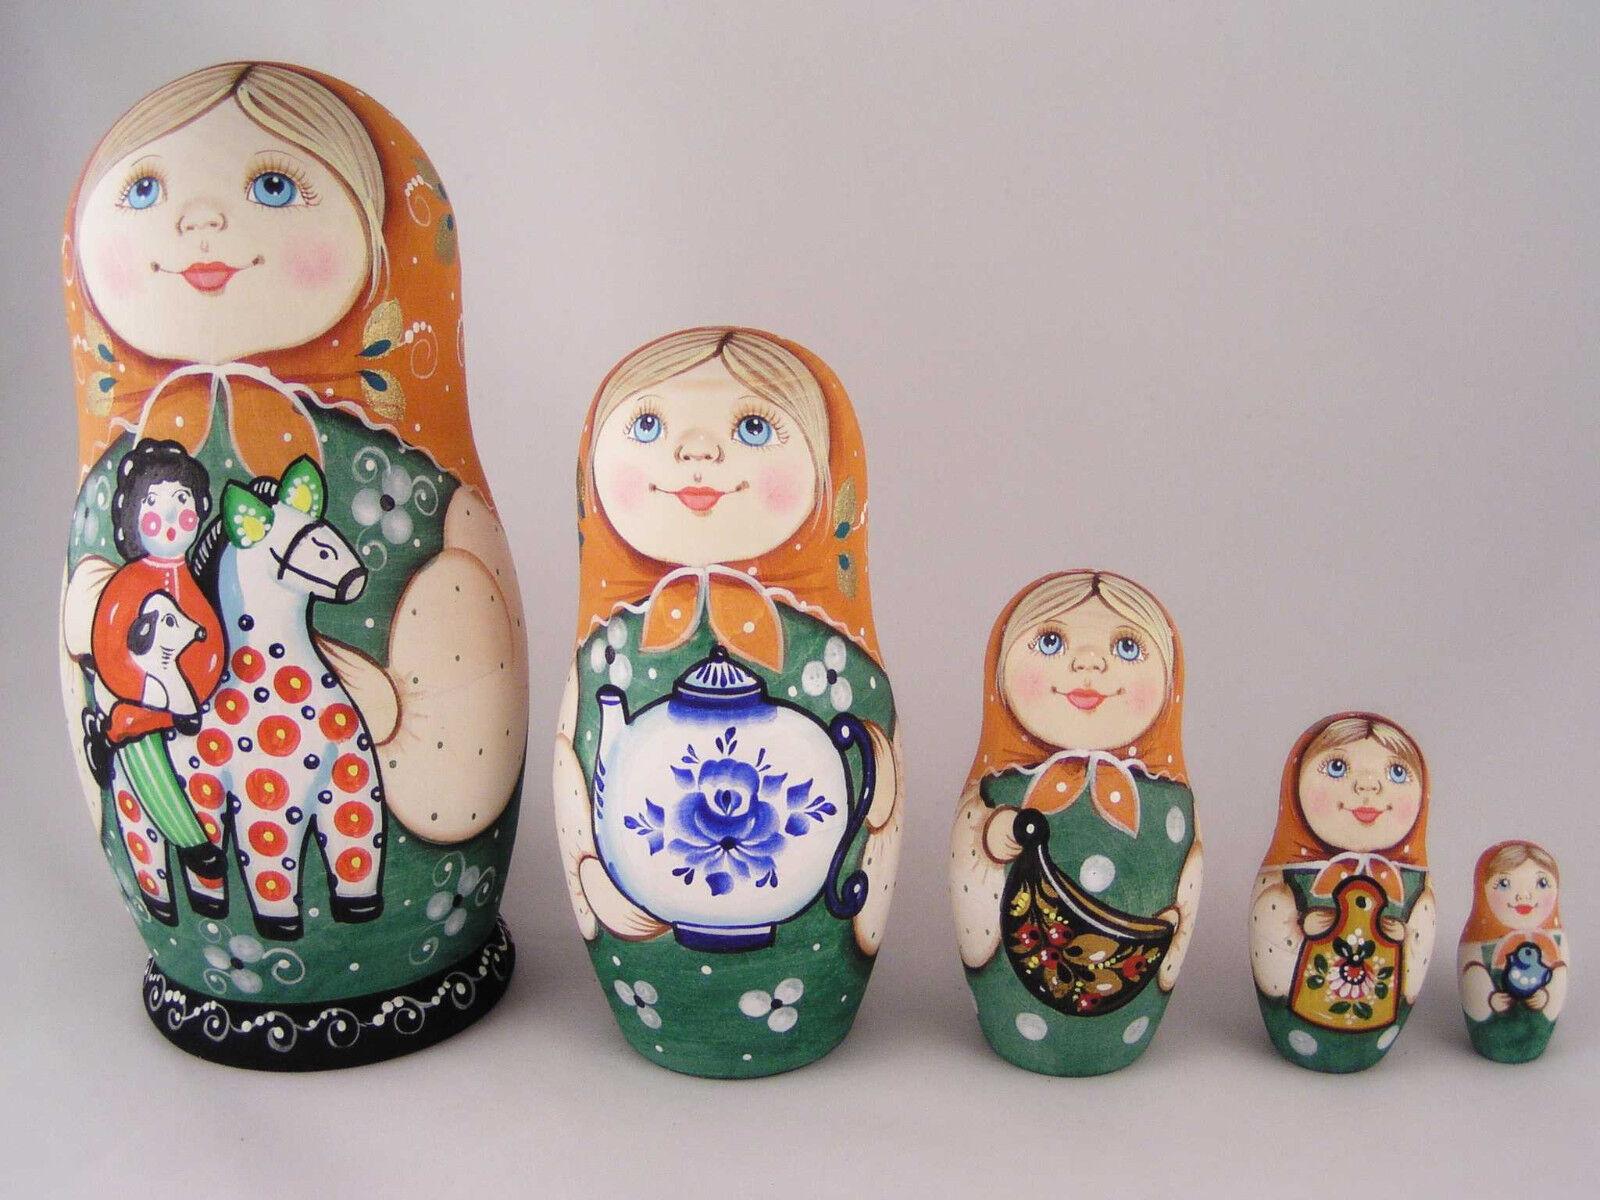 Rusa Matryoshka Babushka de madera de anidación de apilamiento Muñeca Niñas Juguetes 5 Piezas